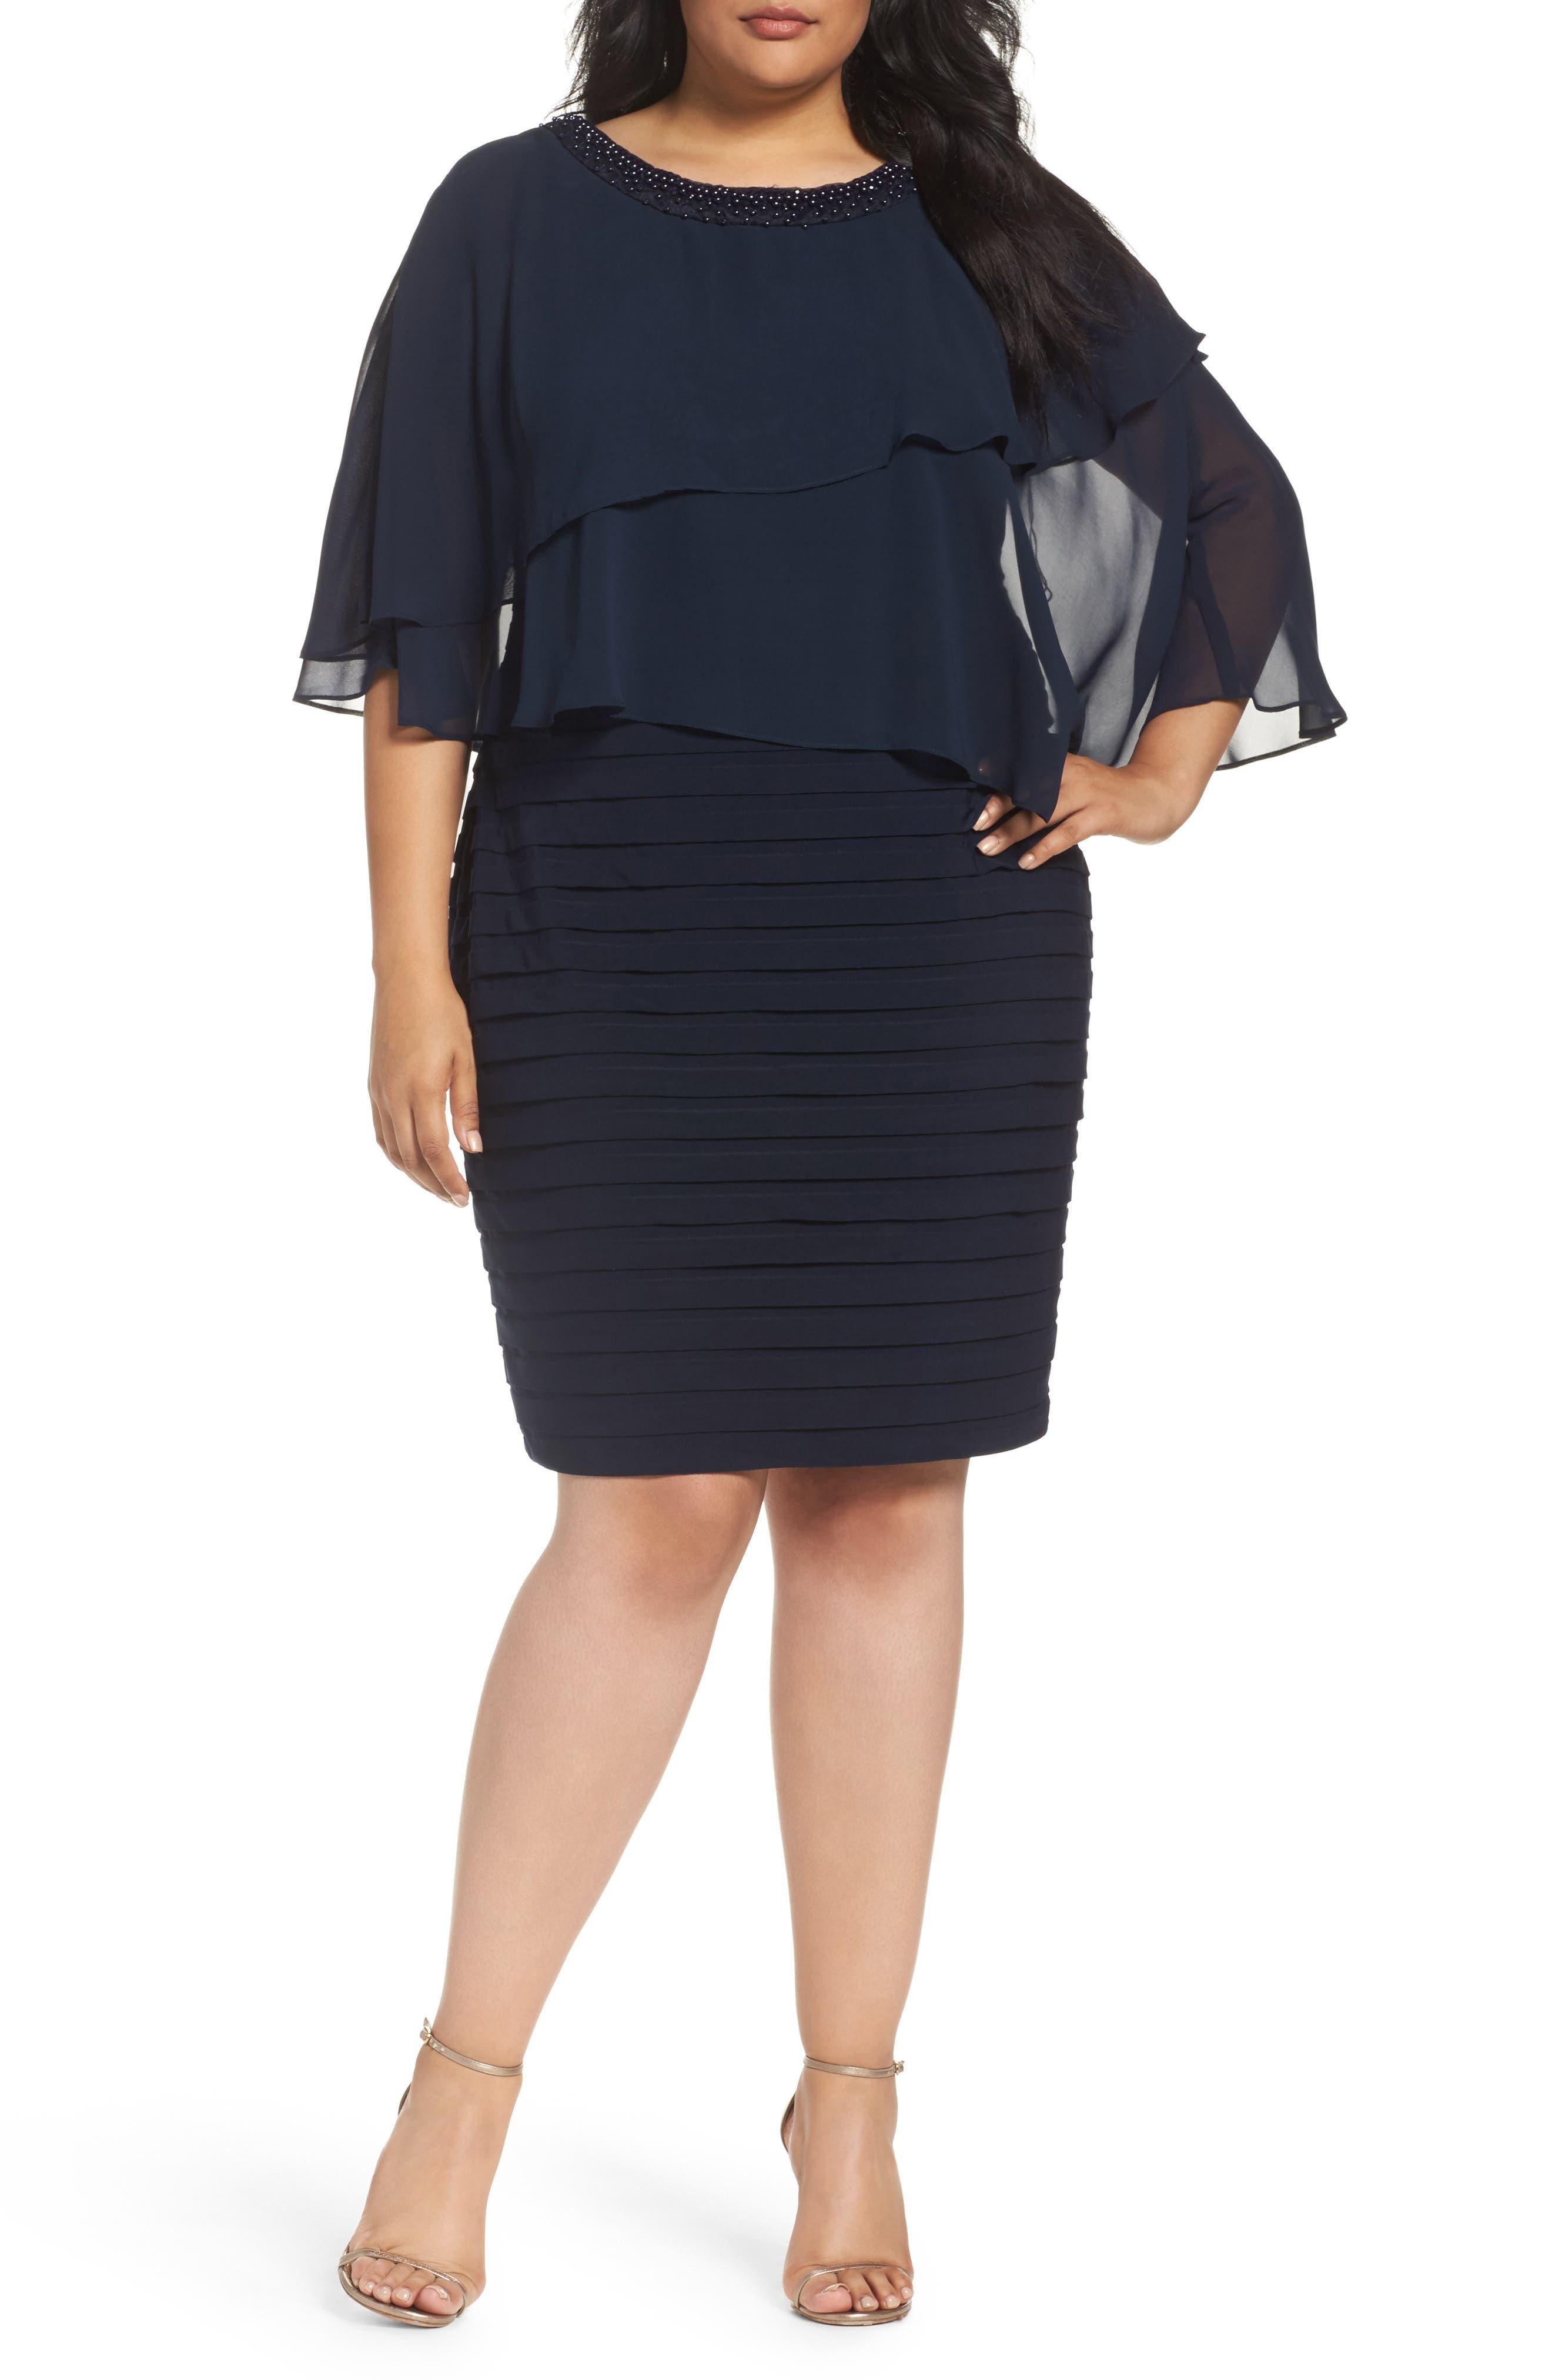 Adrianna Papell Embellished Capelet Sheath Dress (Plus Size)